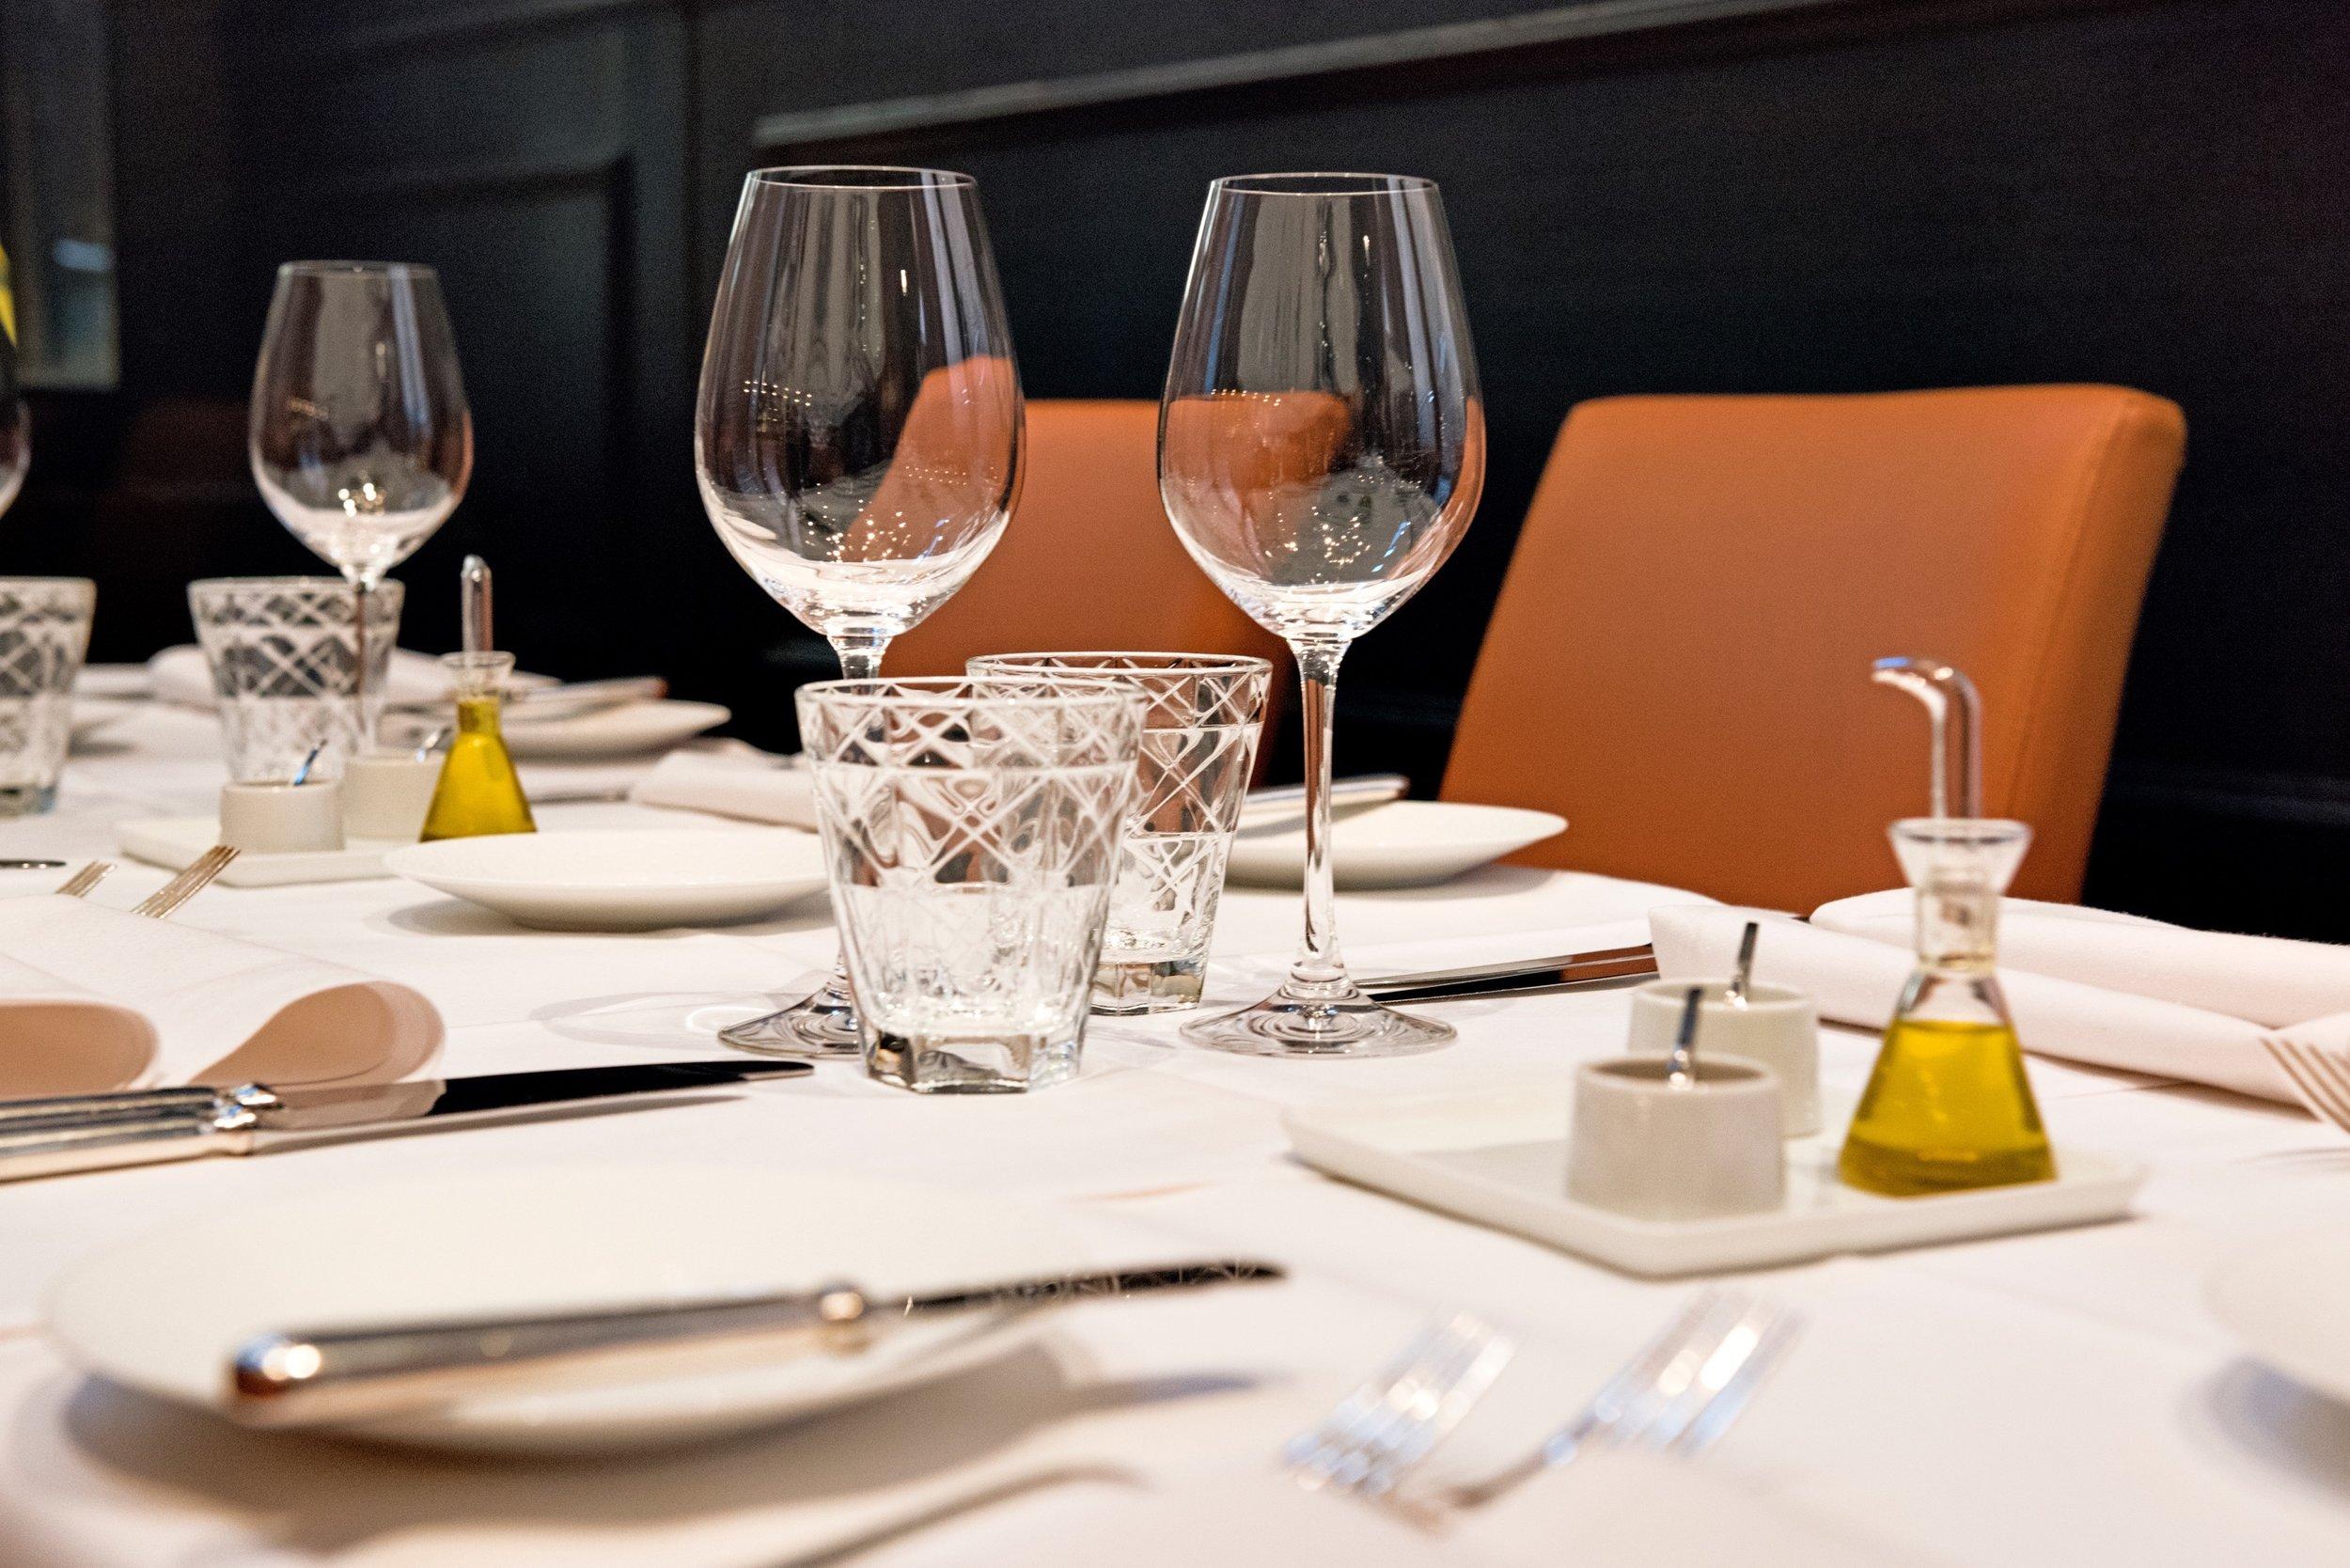 20 michelin restaurant the glorious antwerpen tablefever bart albrecht.jpg